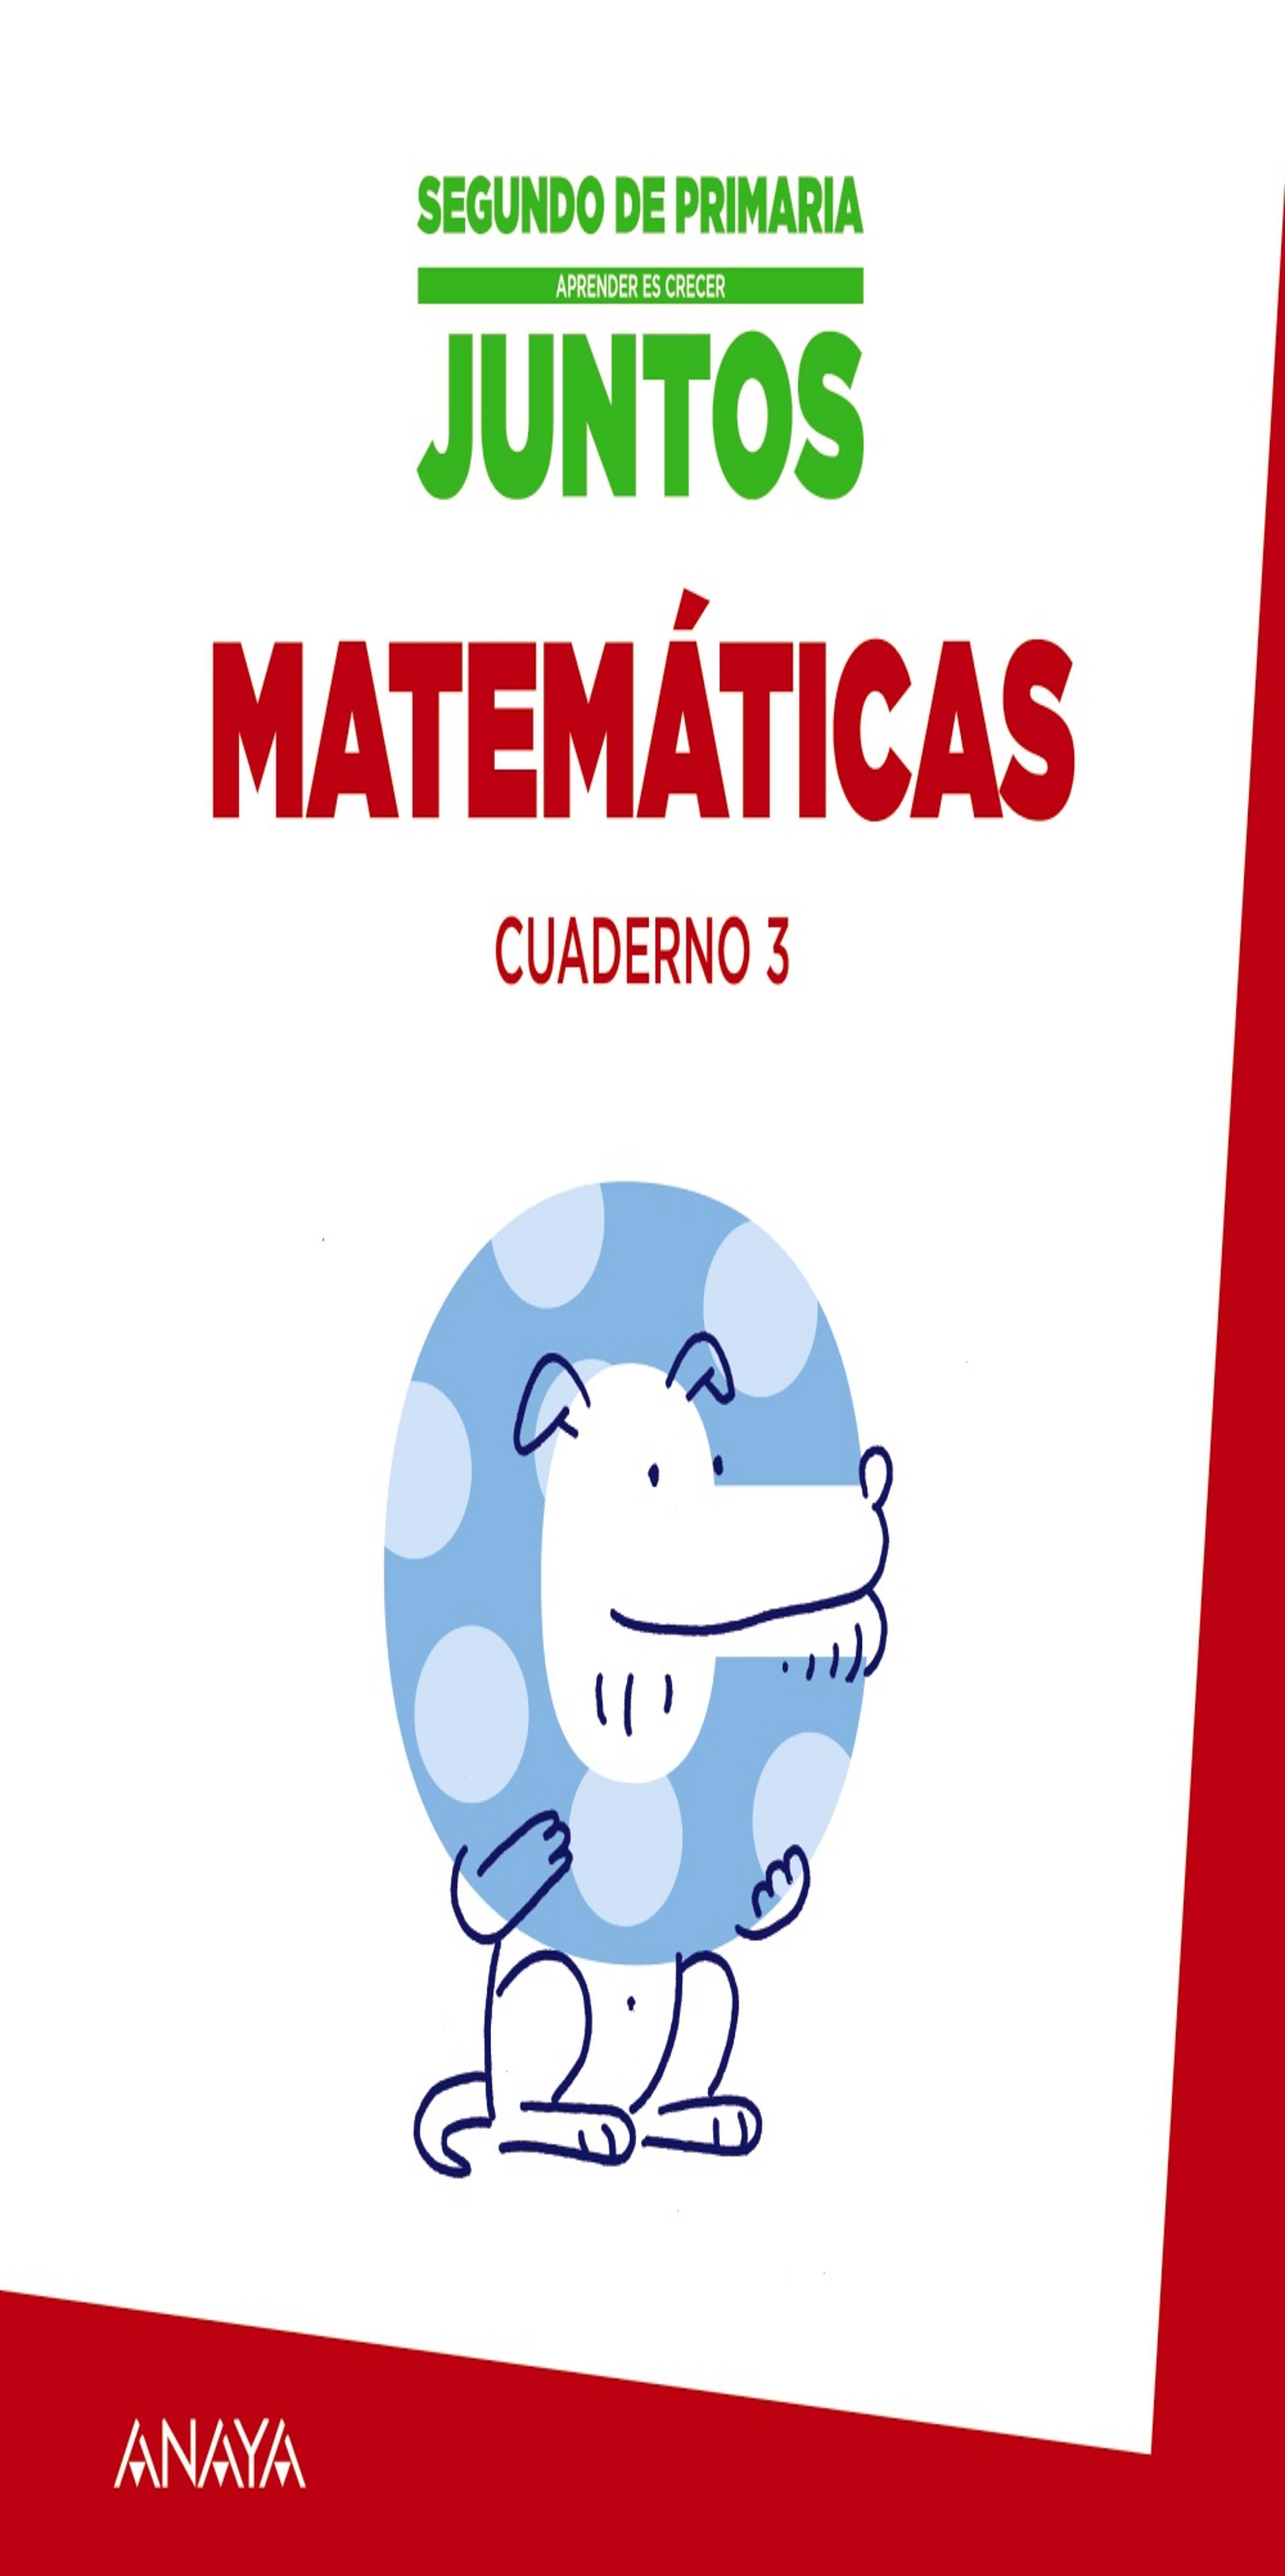 CUAD MATEMÁTICAS 3 JUNTOS Aprender es Crecer 2º PRIM